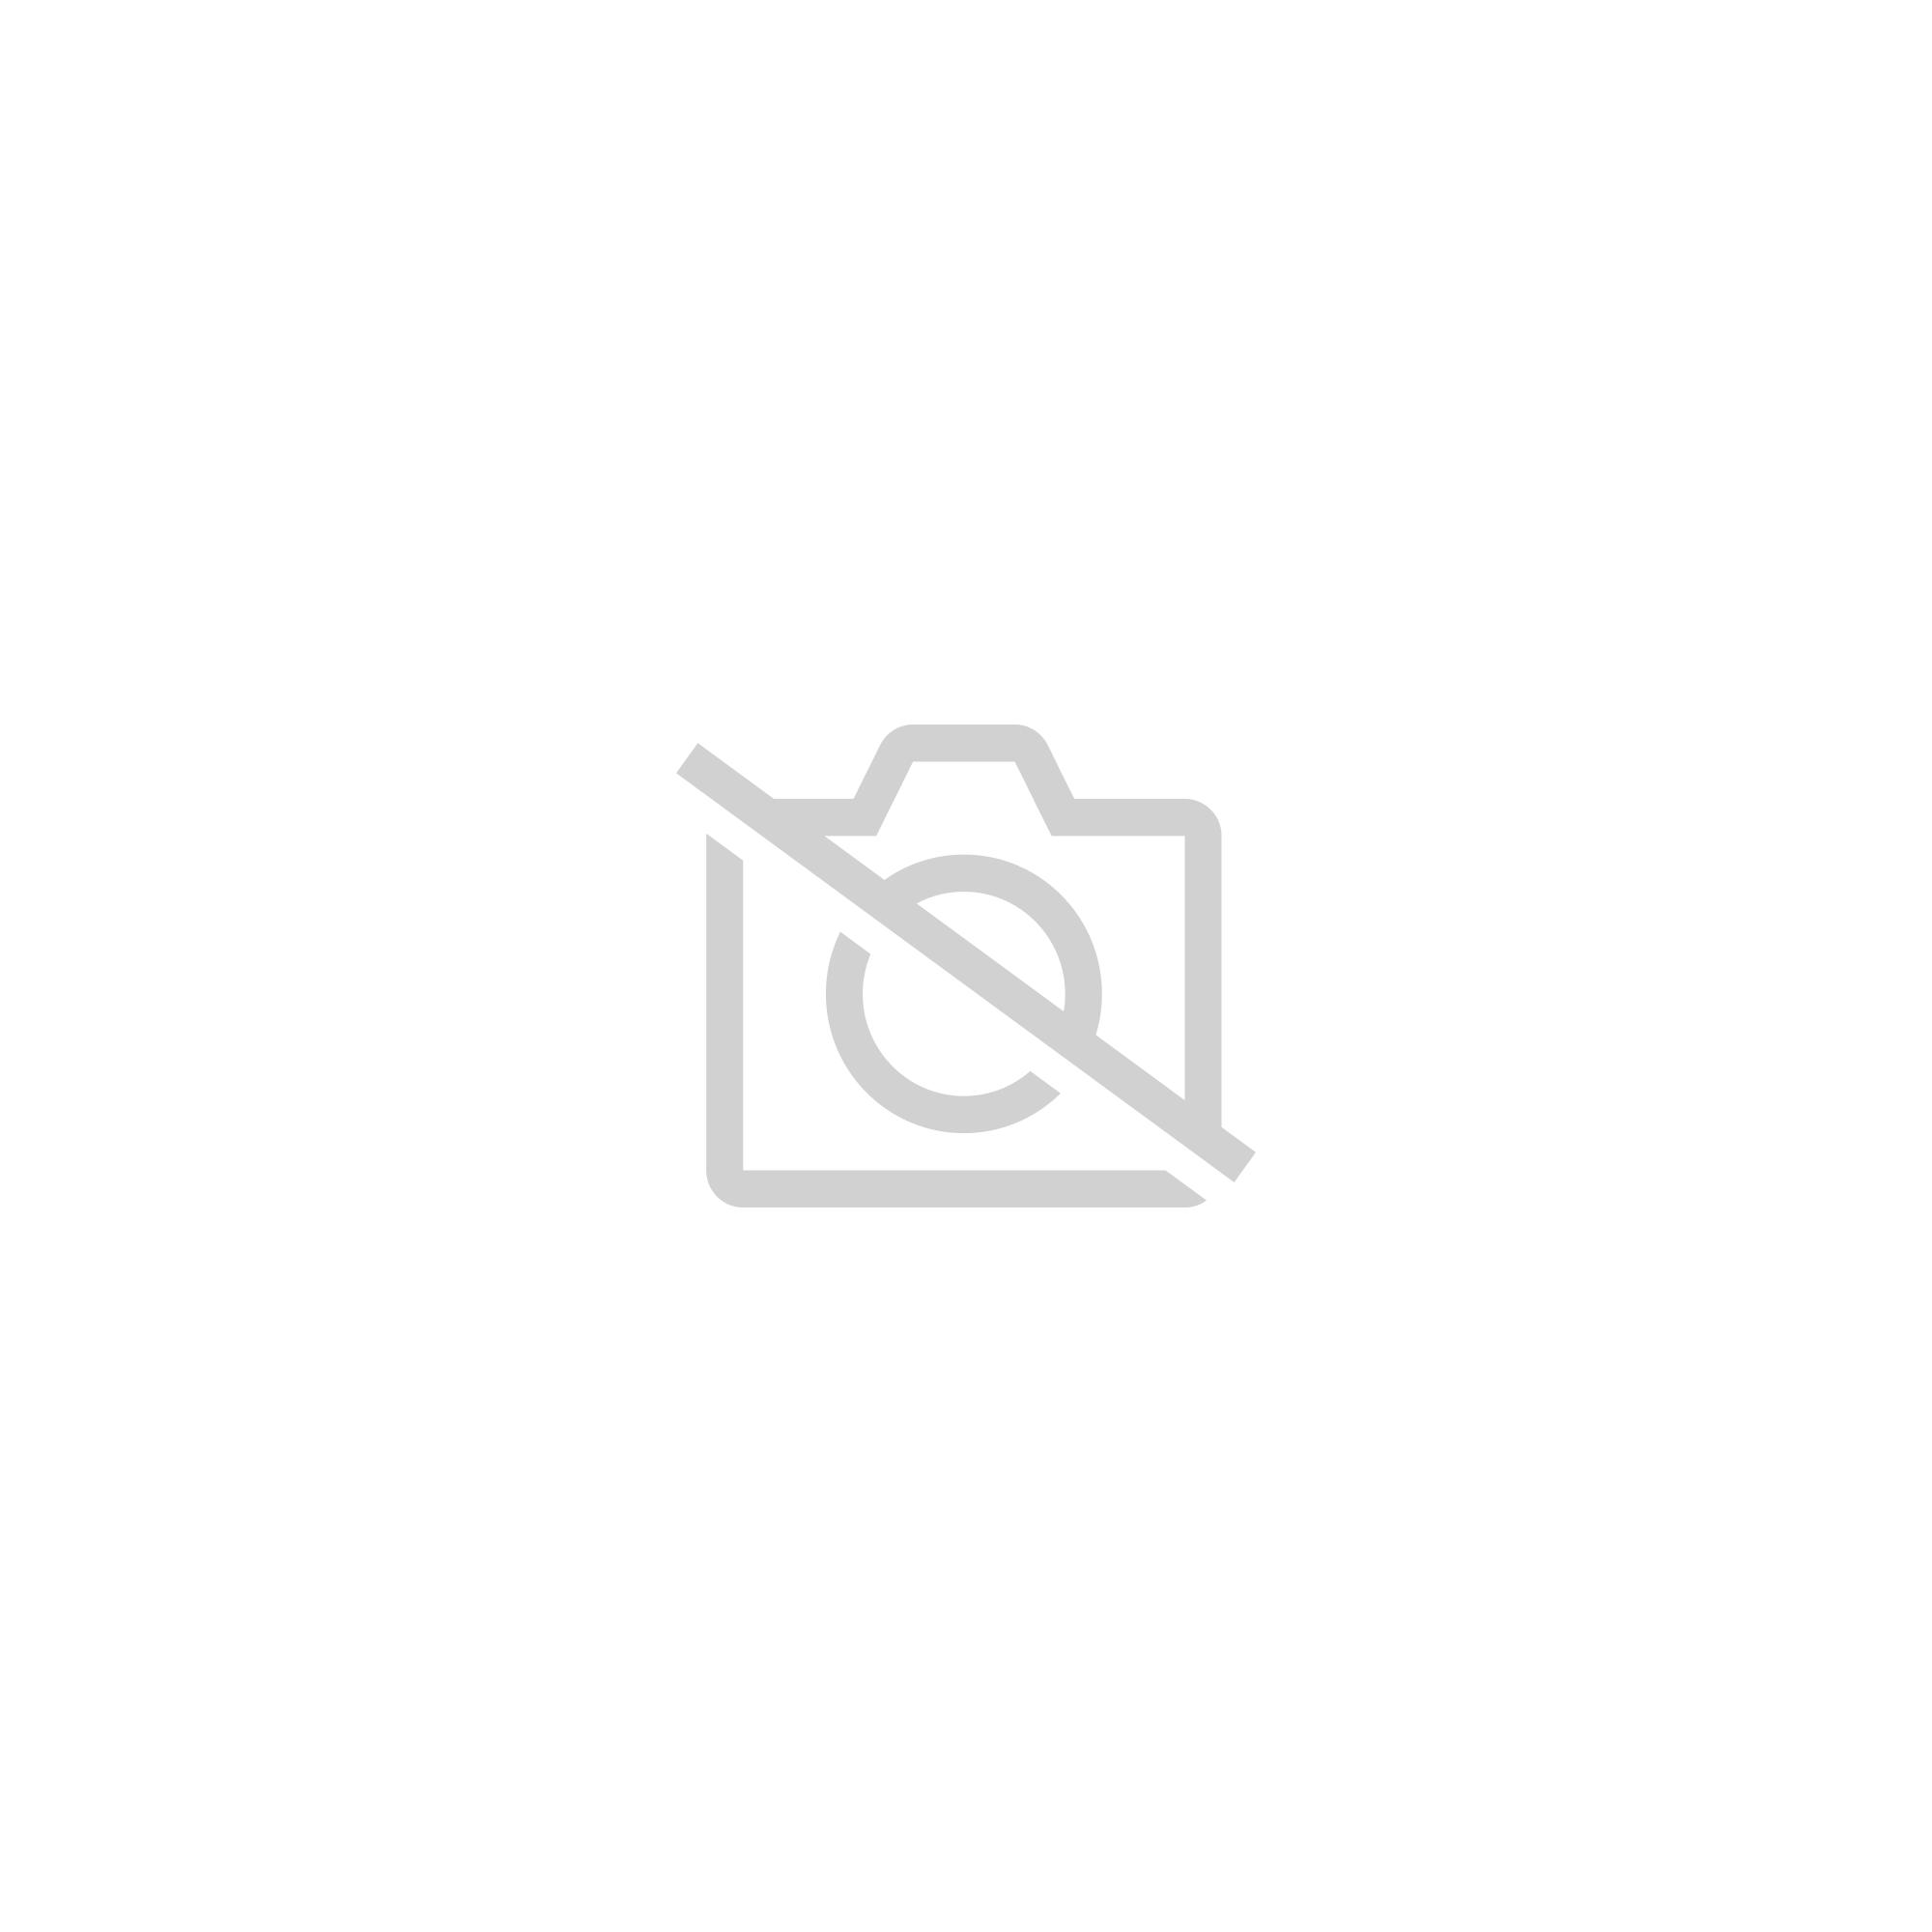 Hanro Woolen Silk Legging Homme - Gris 073412-0176 Small